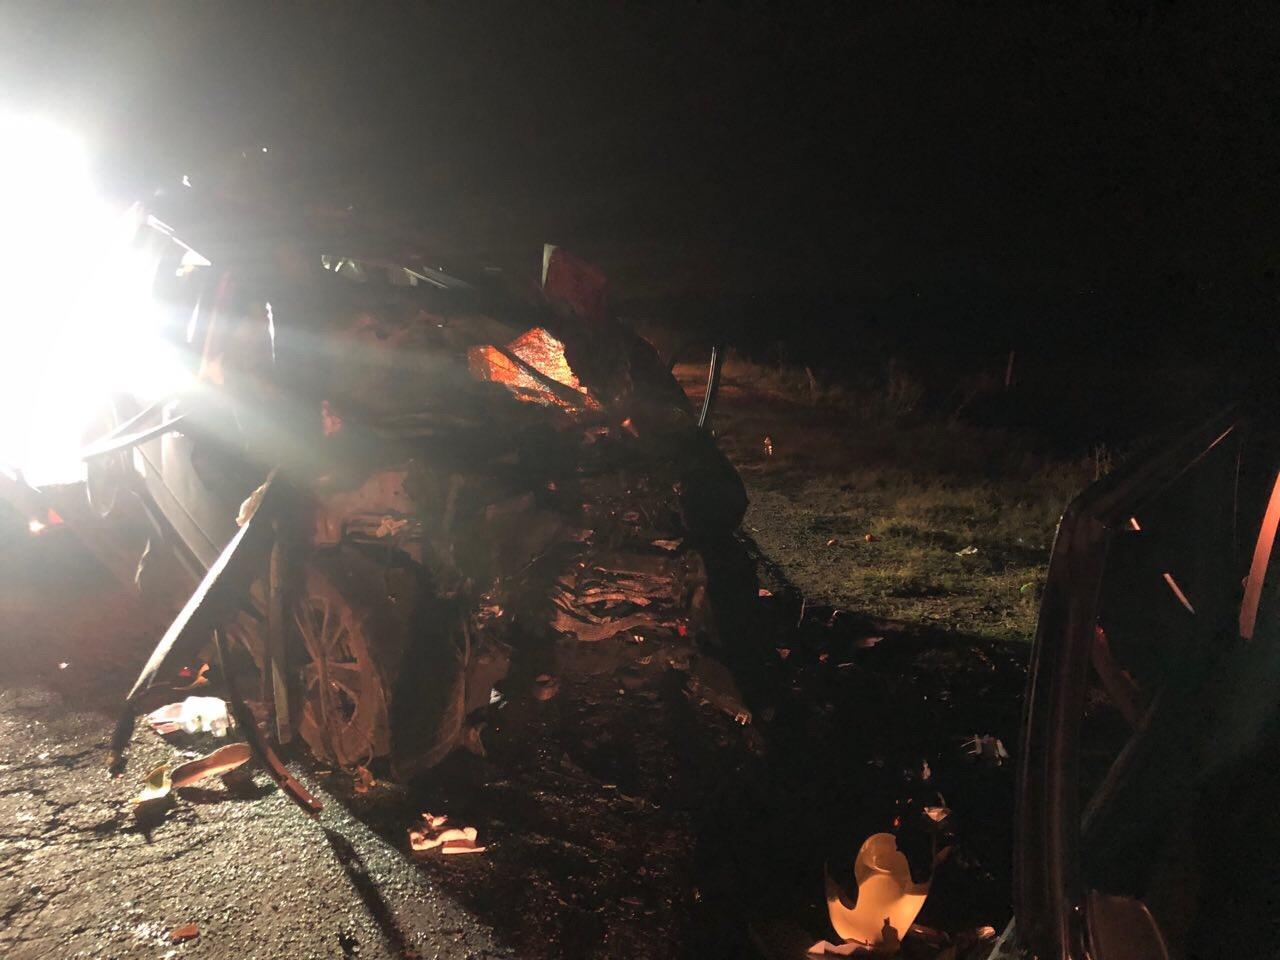 Уснул за рулем: на западе Крыма в лобовом ДТП погиб мужчина, ребенок и пенсионер в больнице